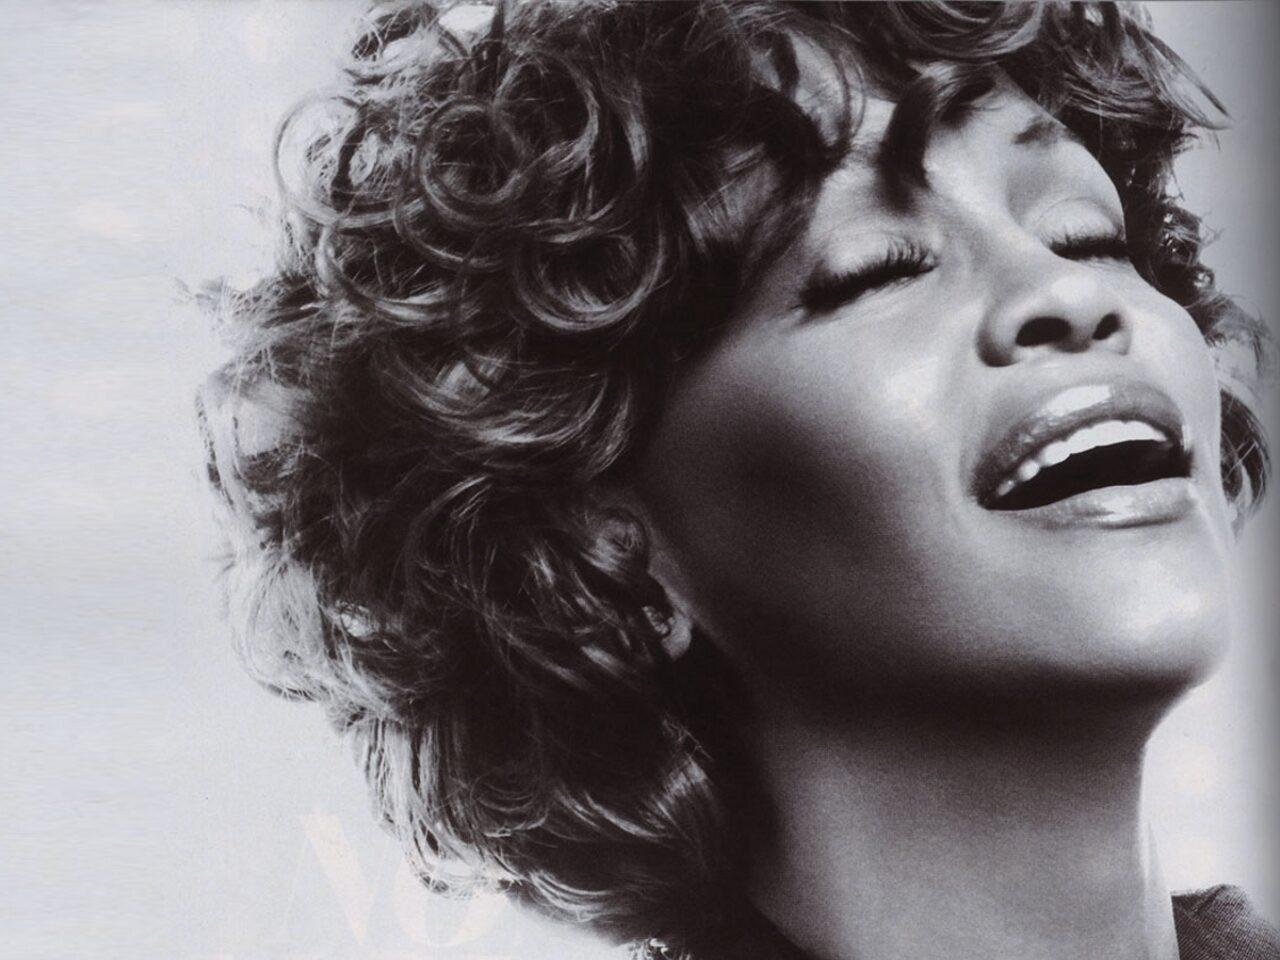 http://4.bp.blogspot.com/-PSS5sm5TB3A/TzjH_Y20B5I/AAAAAAAABNw/i0KyleCCPi4/s1600/Whitney-Houston-muere.jpg